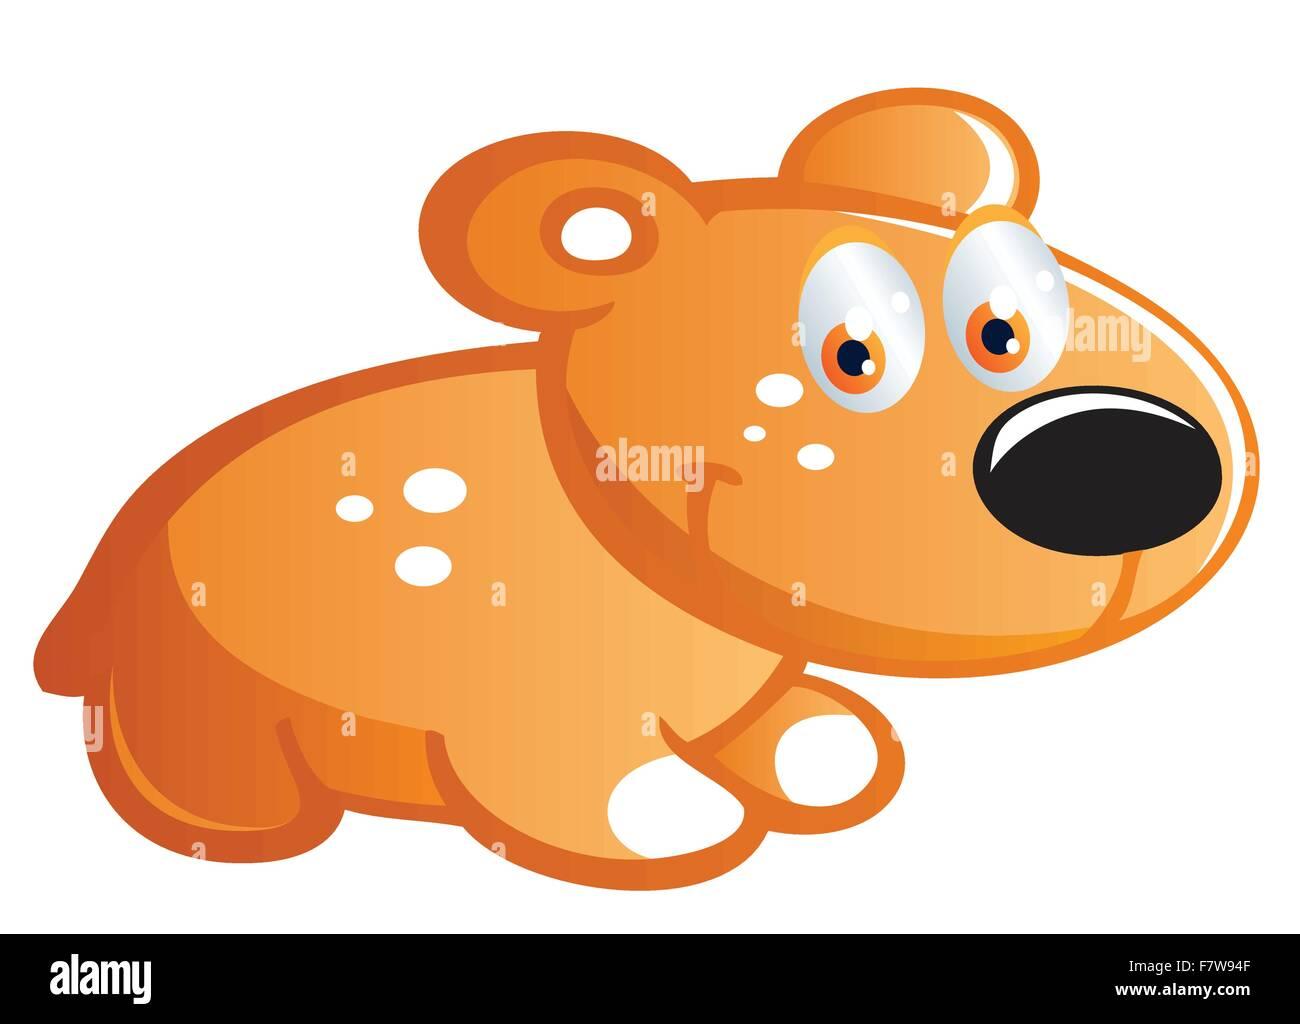 baby mouse cartoon - Stock Vector